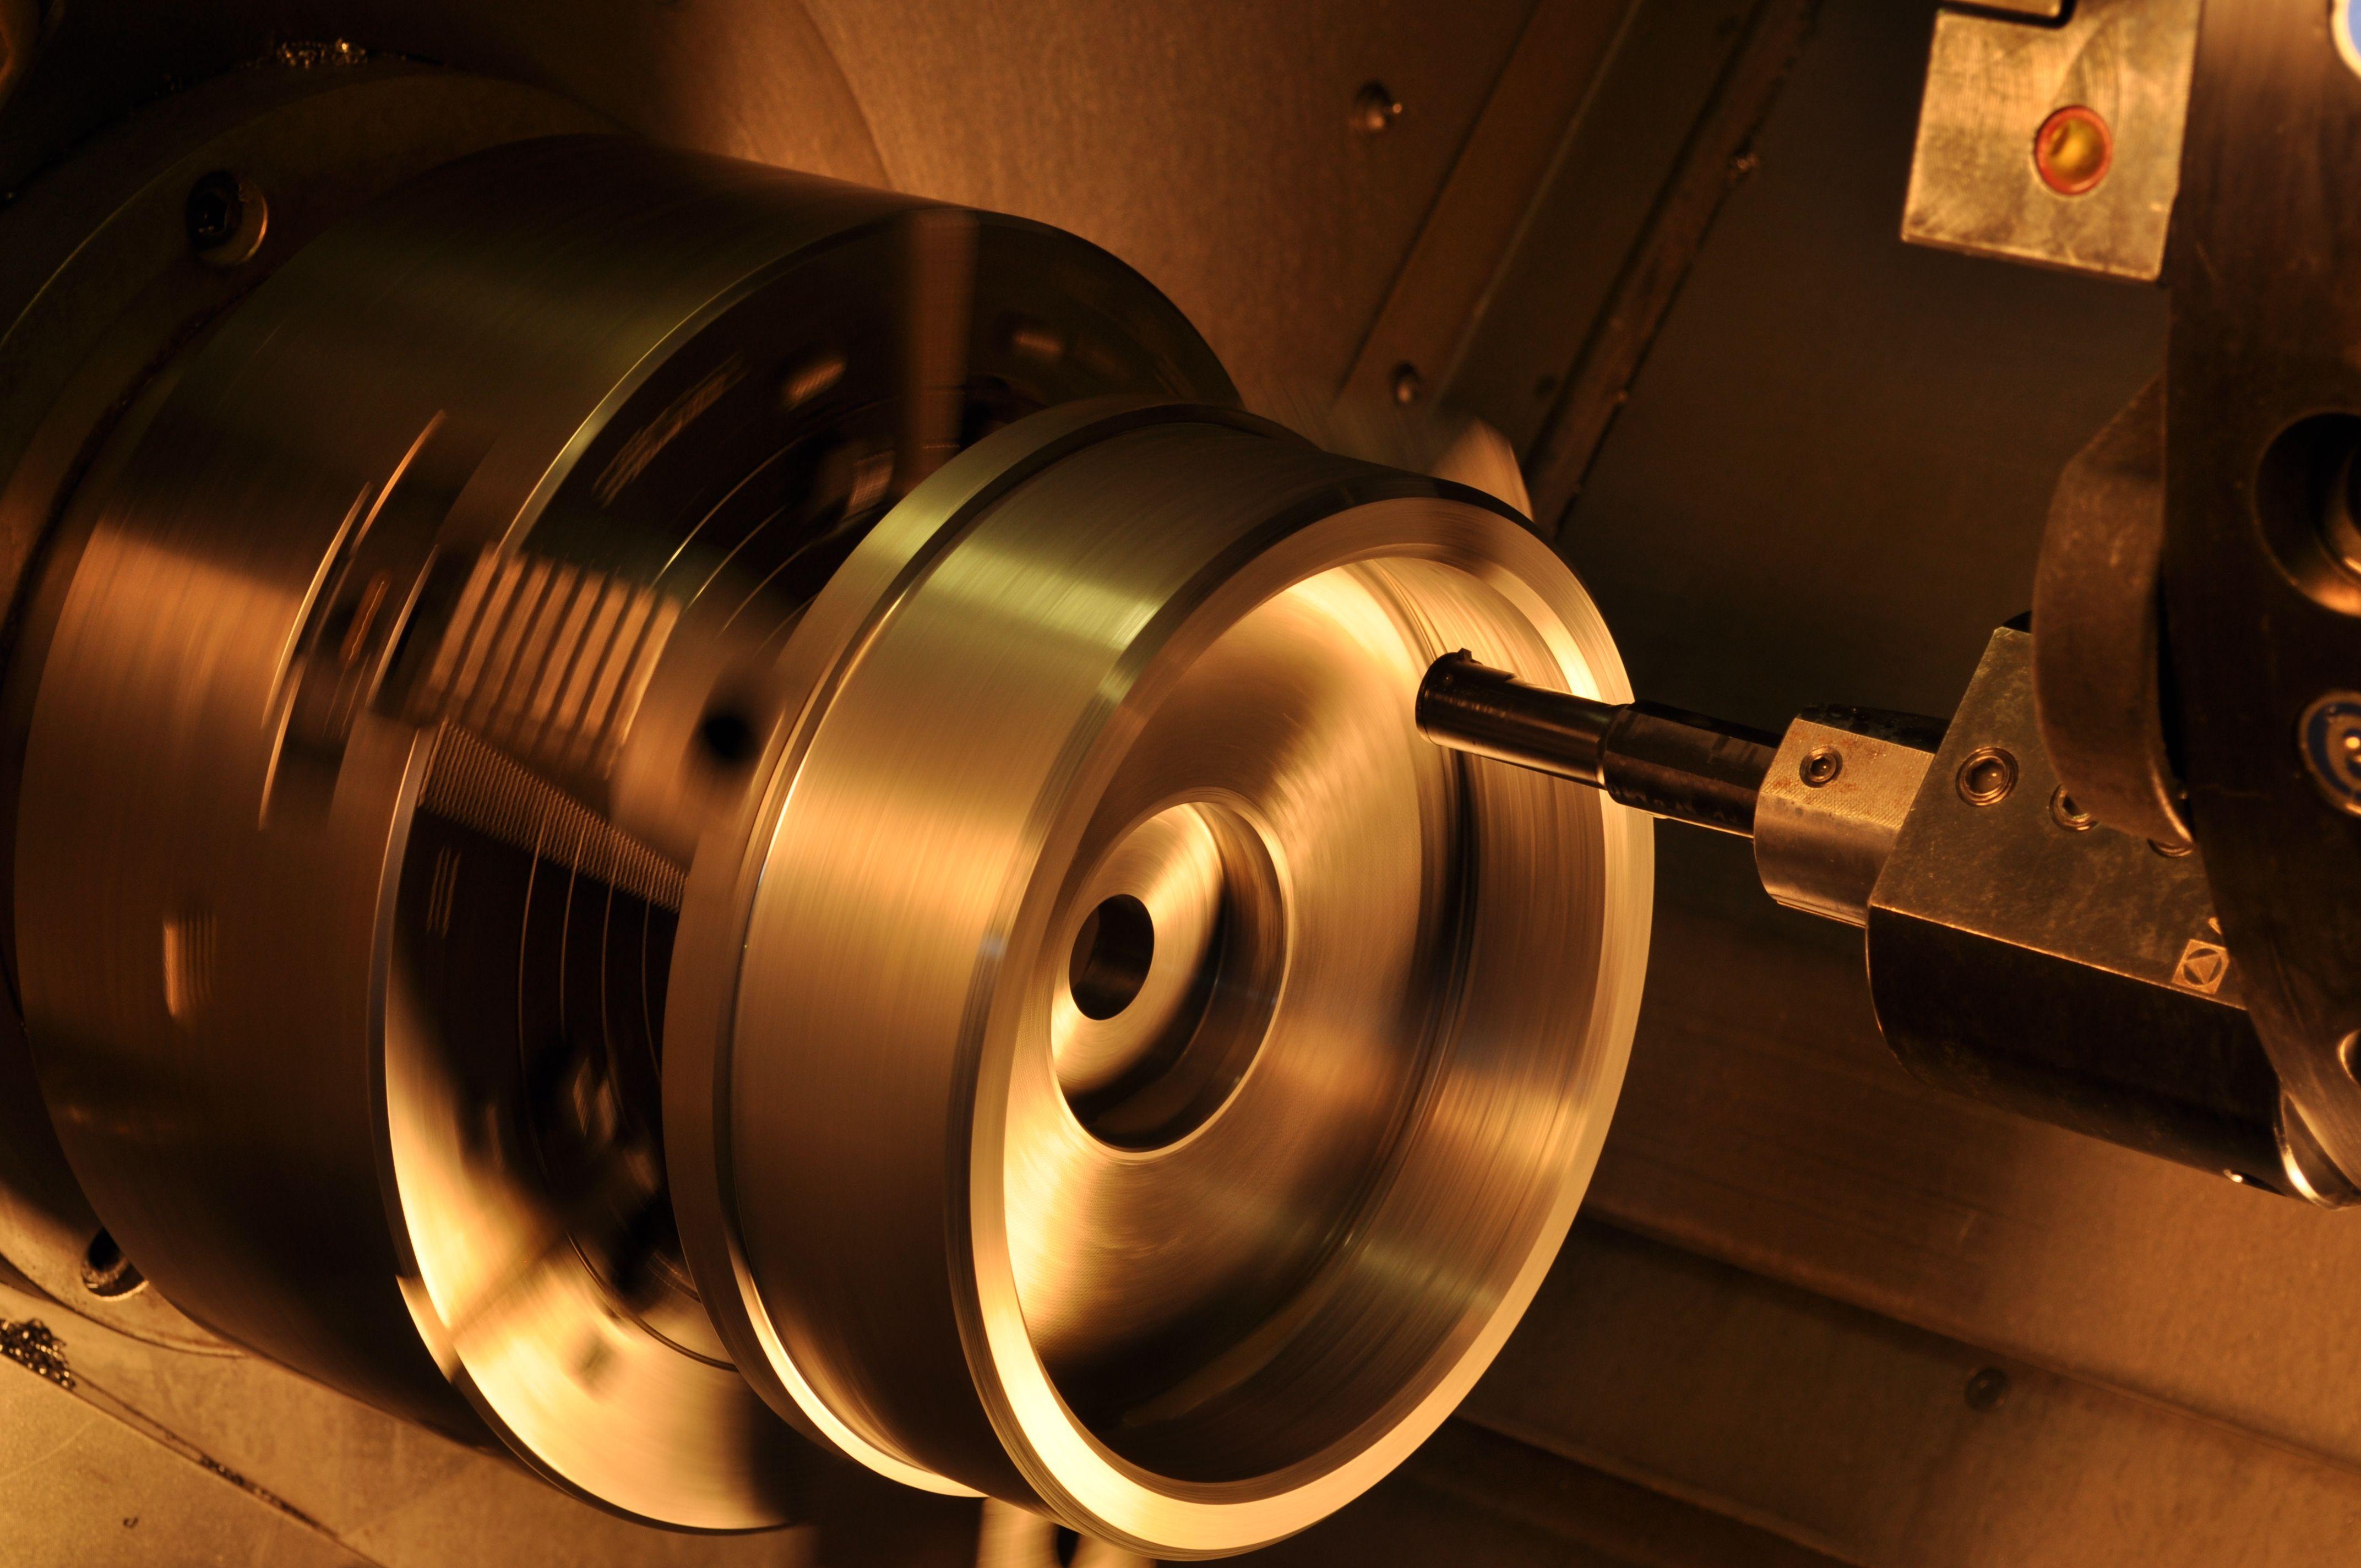 Cnc servicesales across all 50 states cnc machine cnc